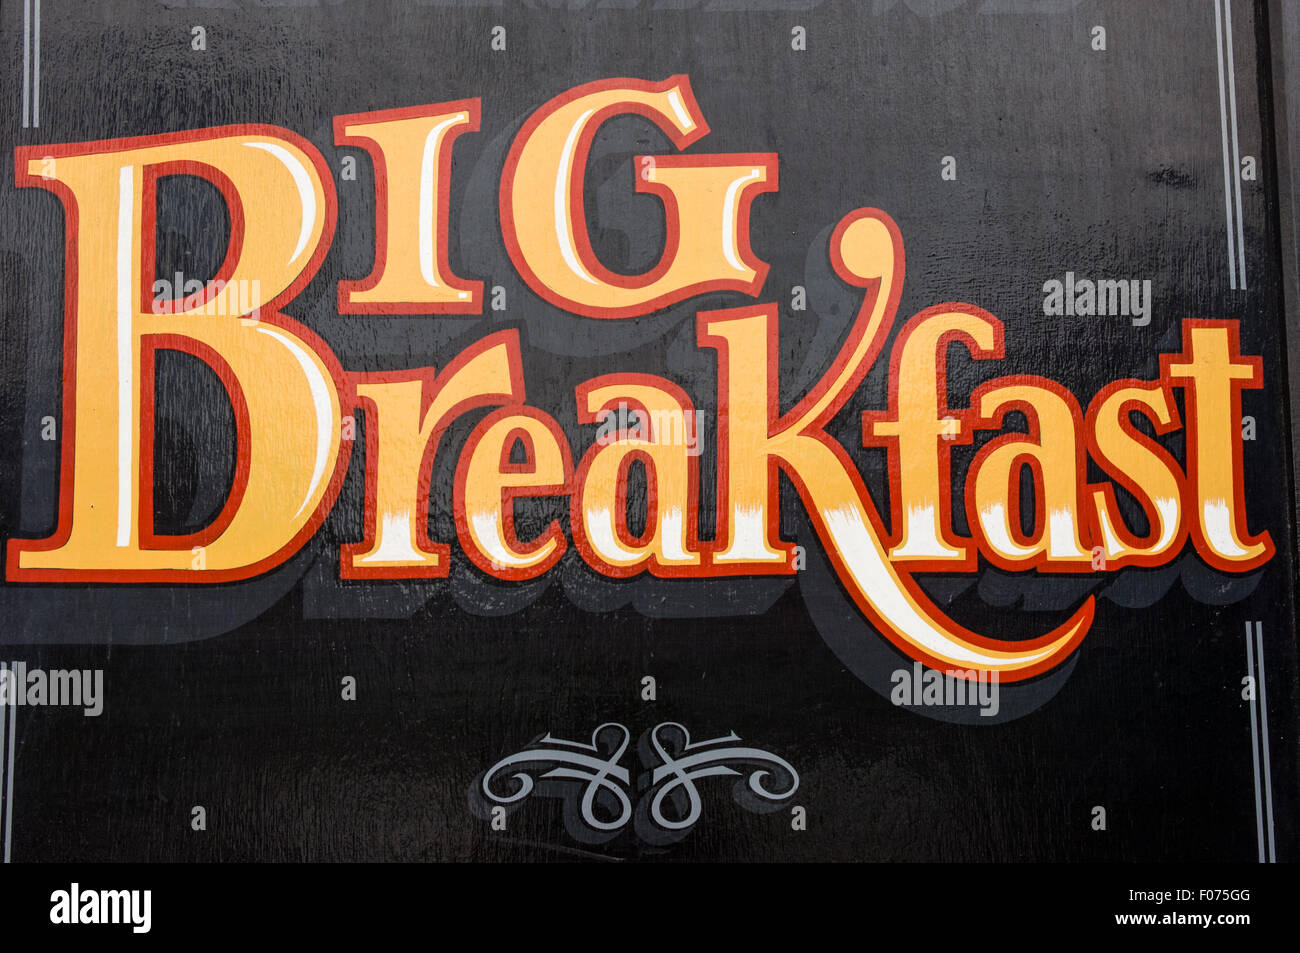 Ireland. Big Breakfast sign gold on black. - Stock Image